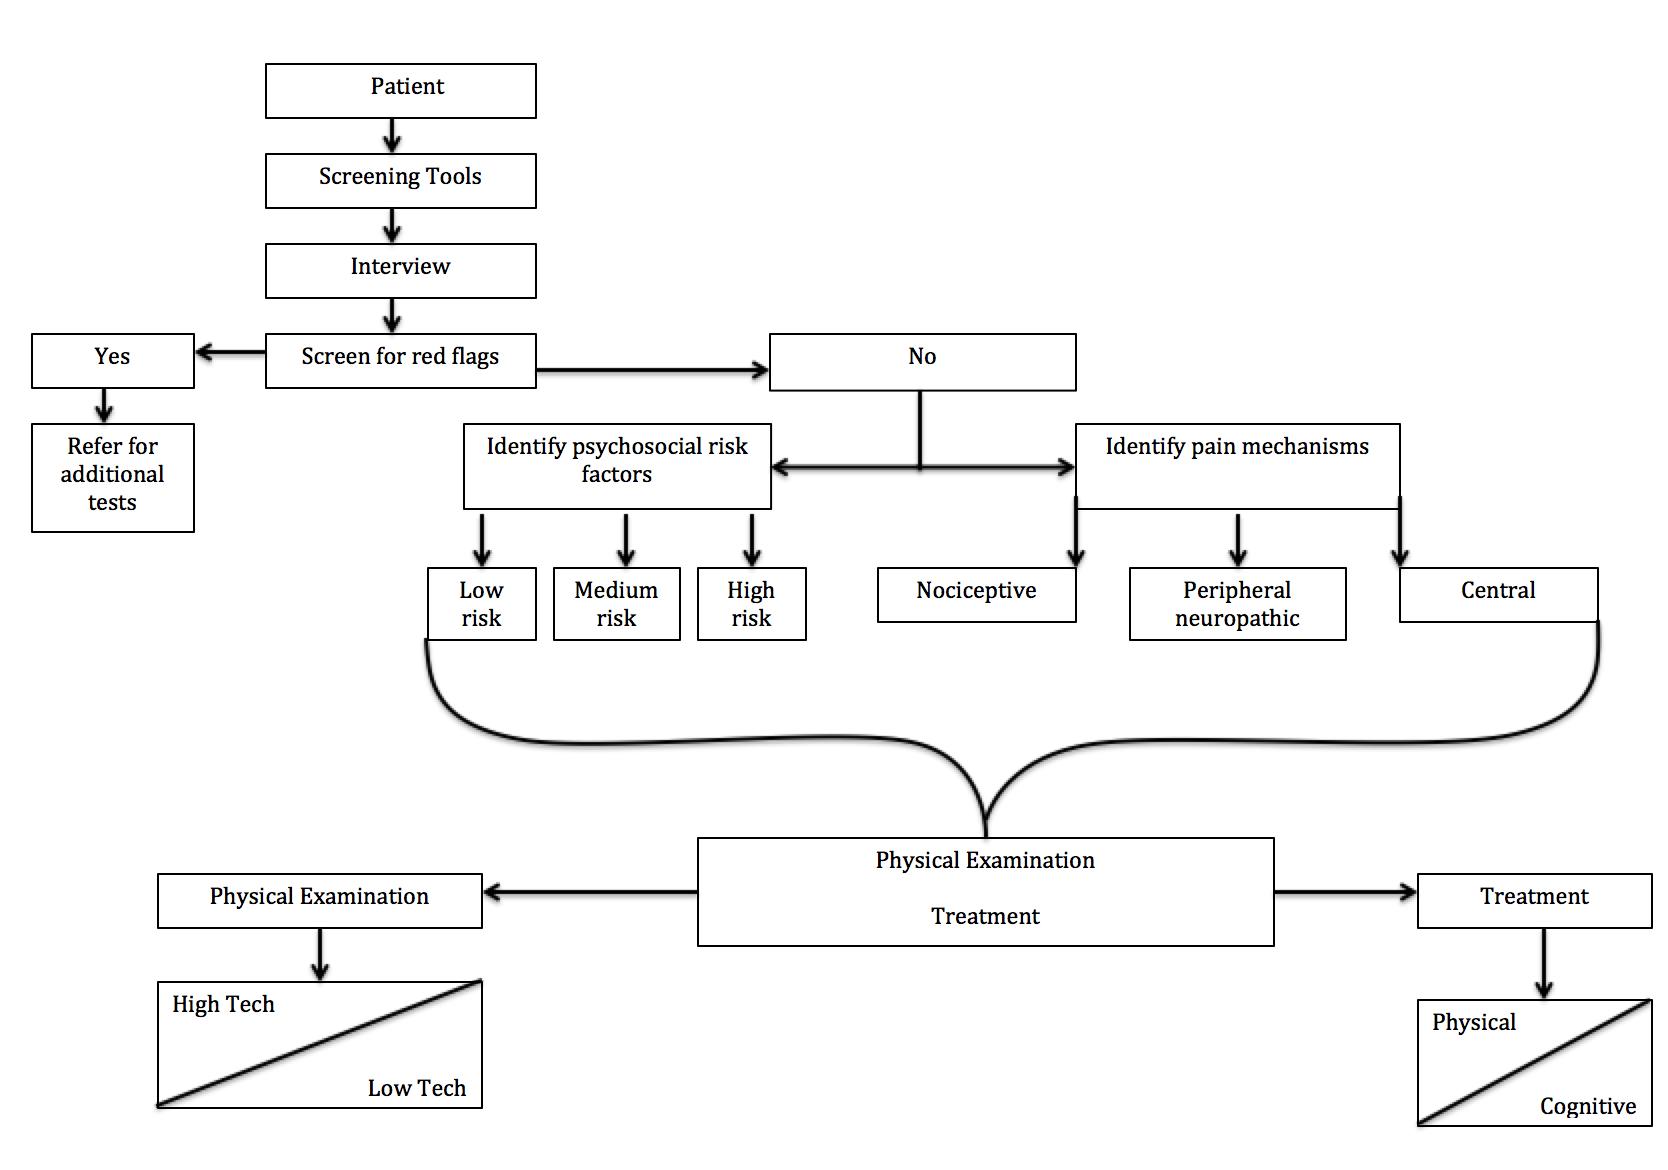 clinical model (diener 2016).png